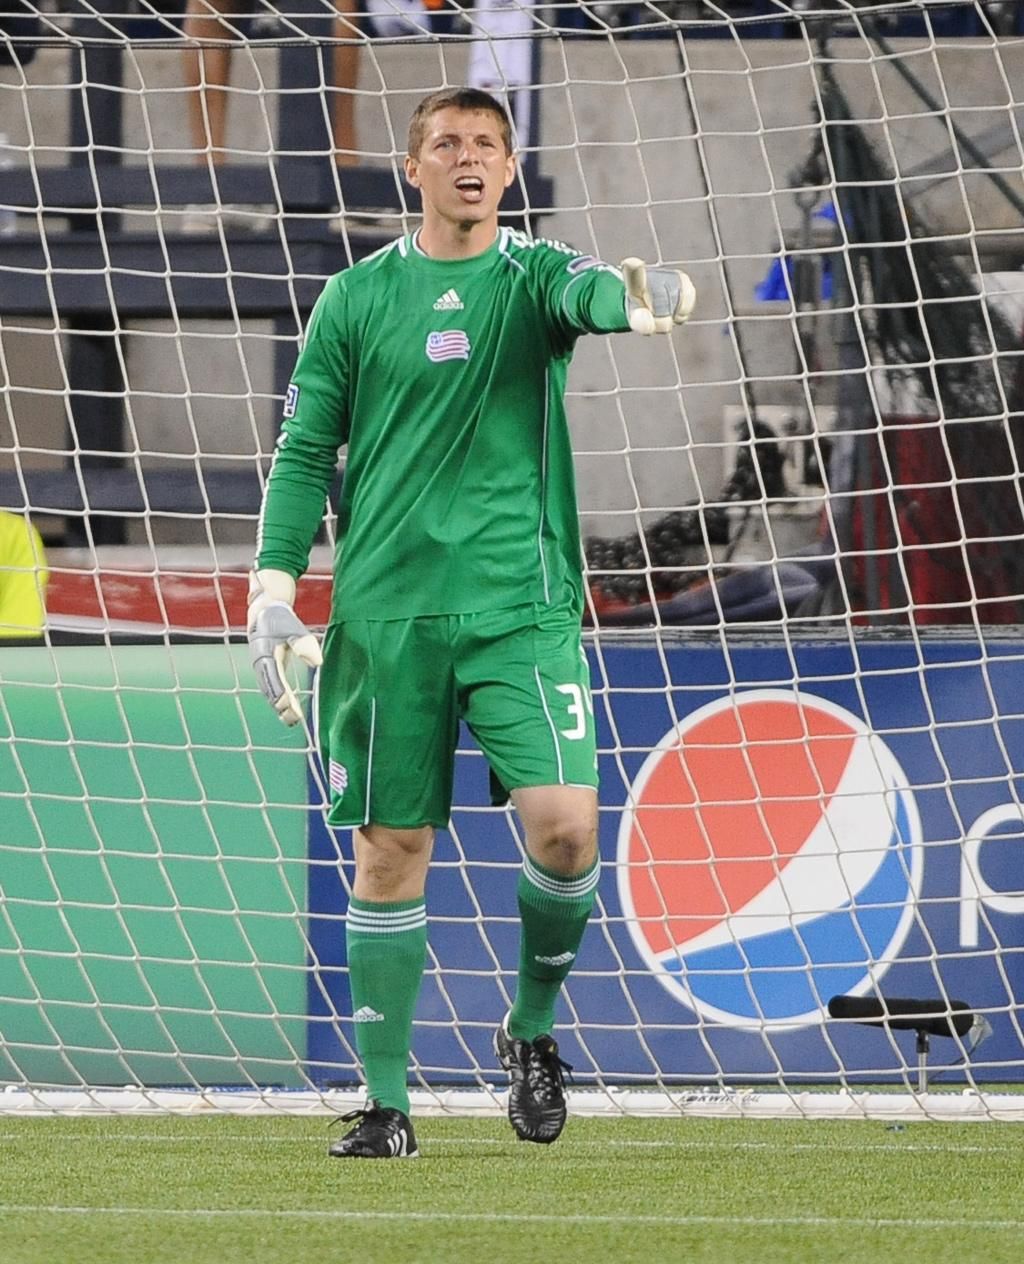 Bobby Shuttleworth will make his second career MLS start on Saturday night in place of the injured Matt Reis